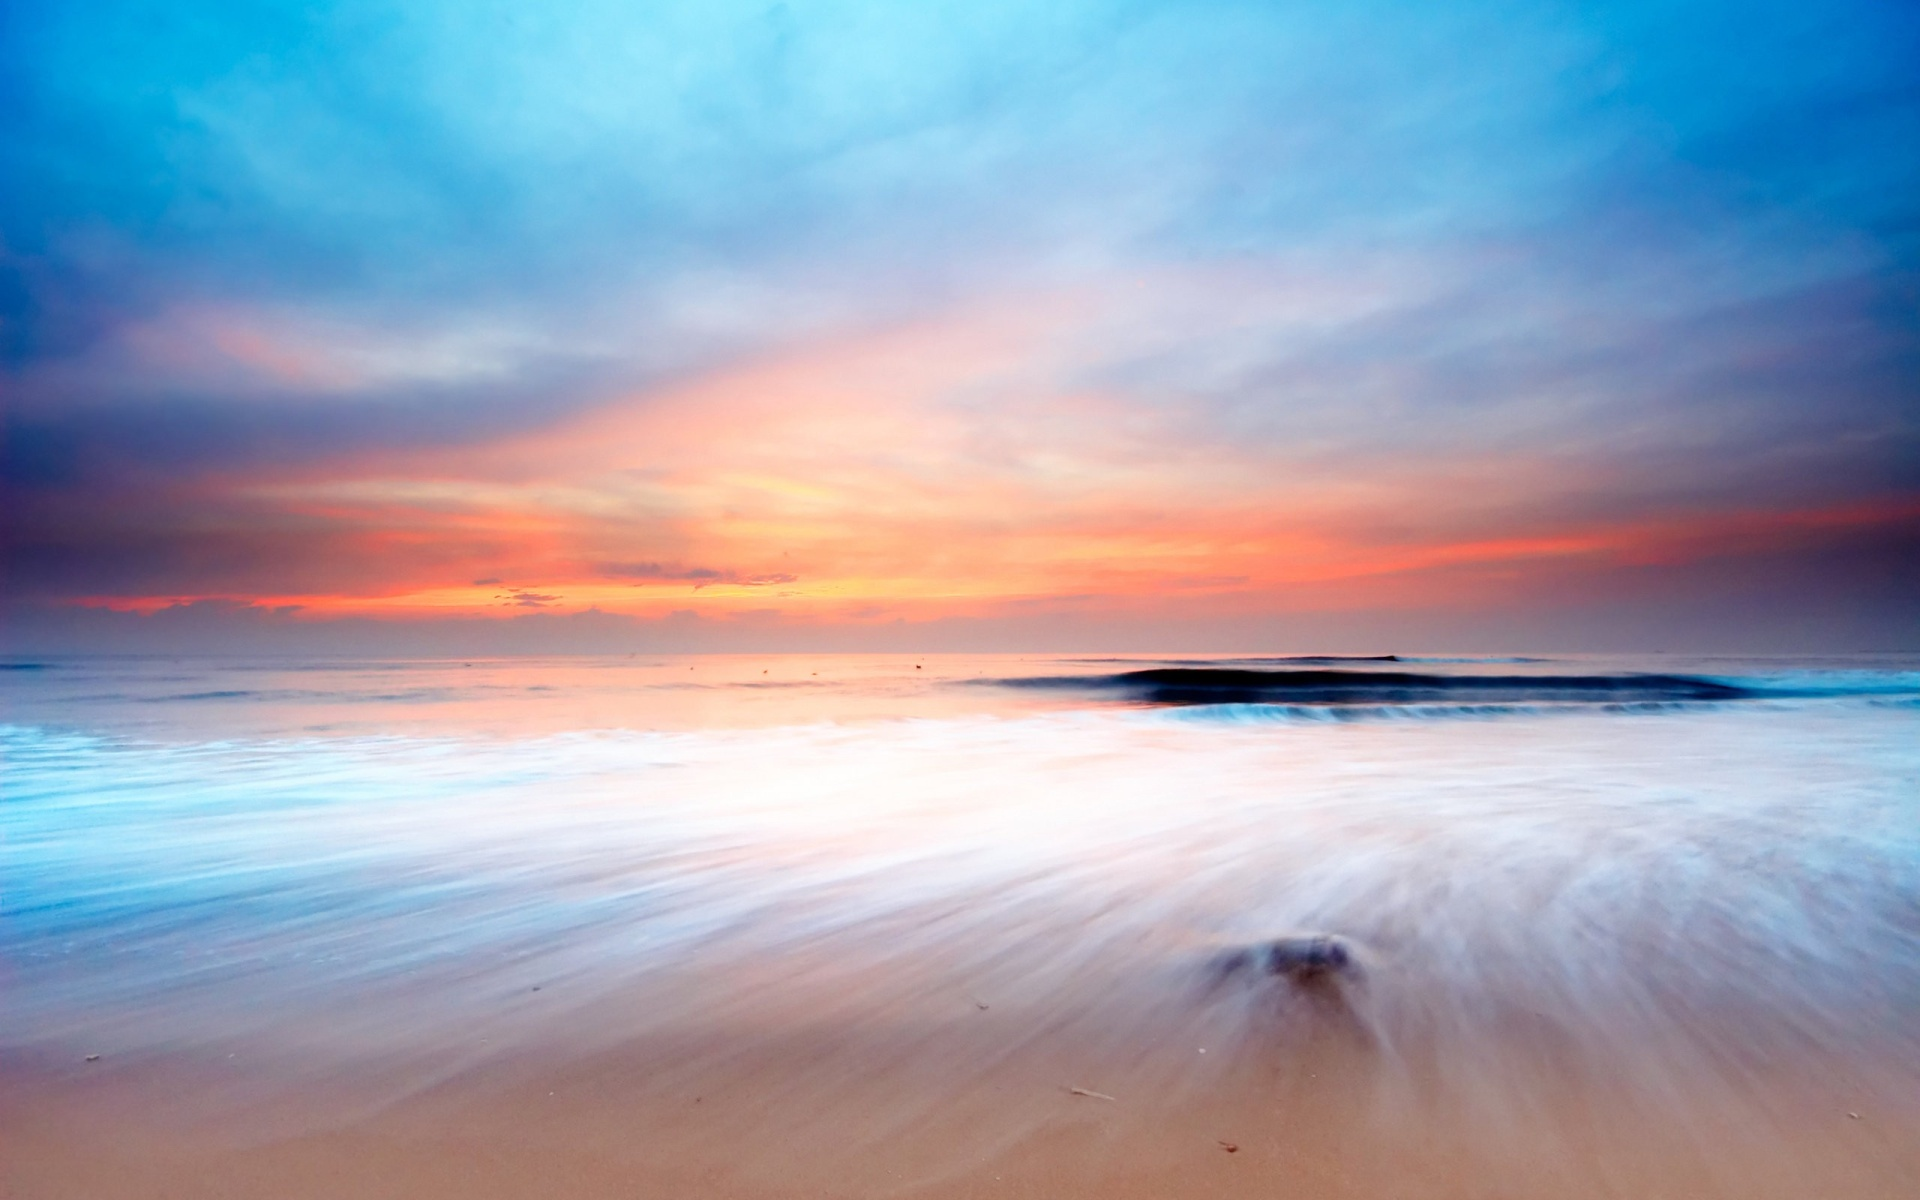 File Name 746384 Beach Beautiful Beach Wave 1920x1200 HQFX Pic 1920x1200